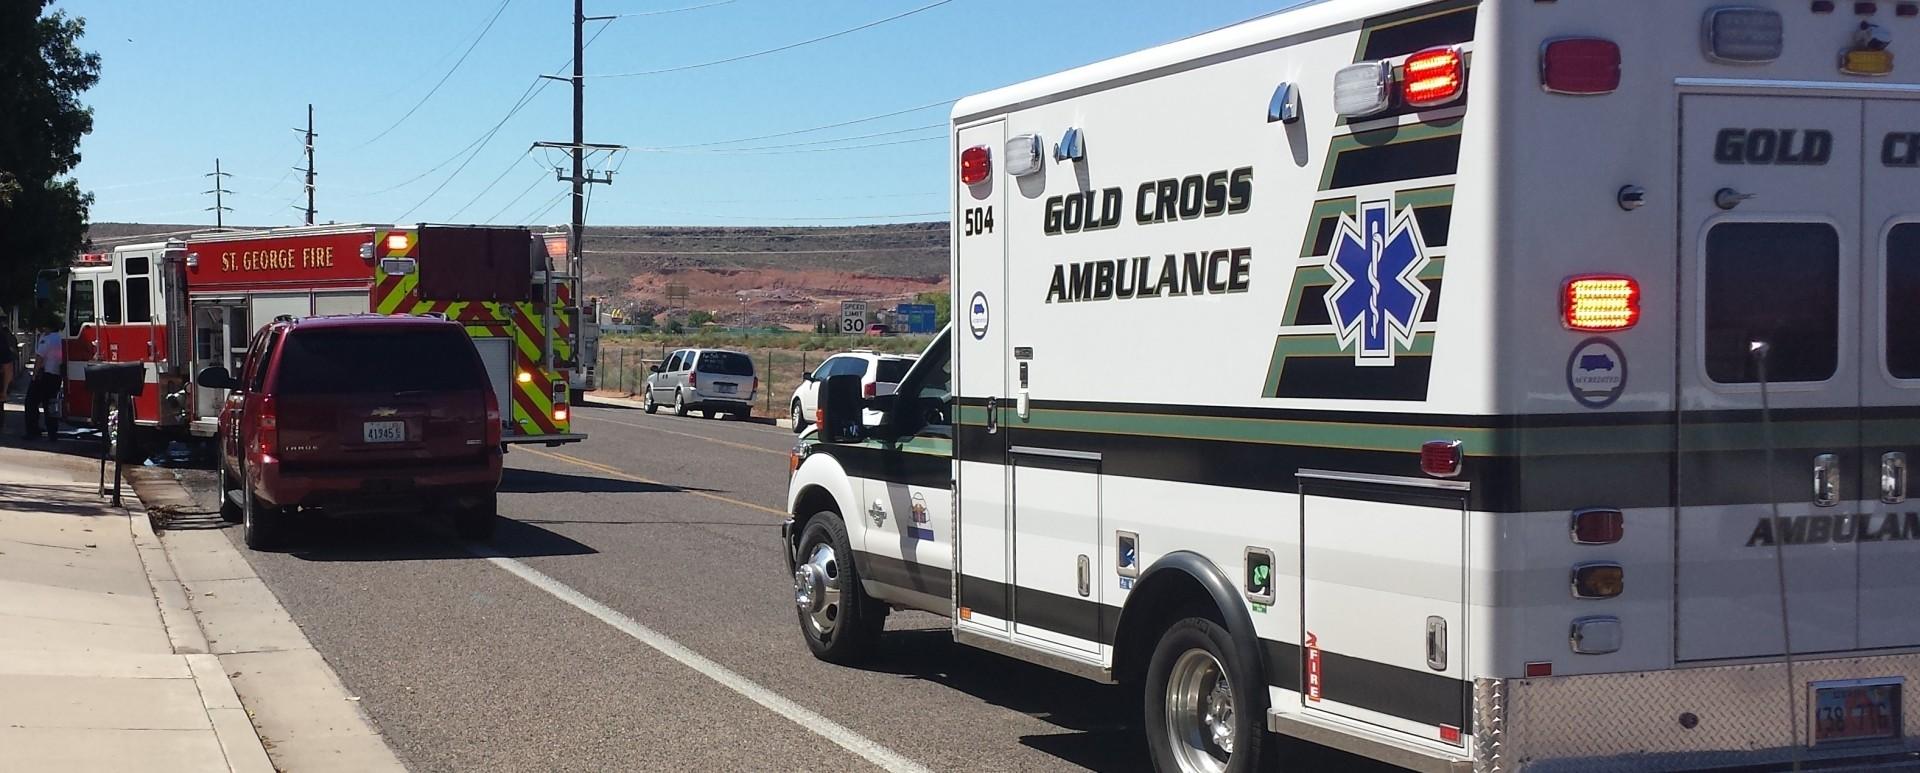 Structure fire at SUU Head Start Preschool. St. George, Utah September 22, 2014   Photo by T.S Romney St. George News